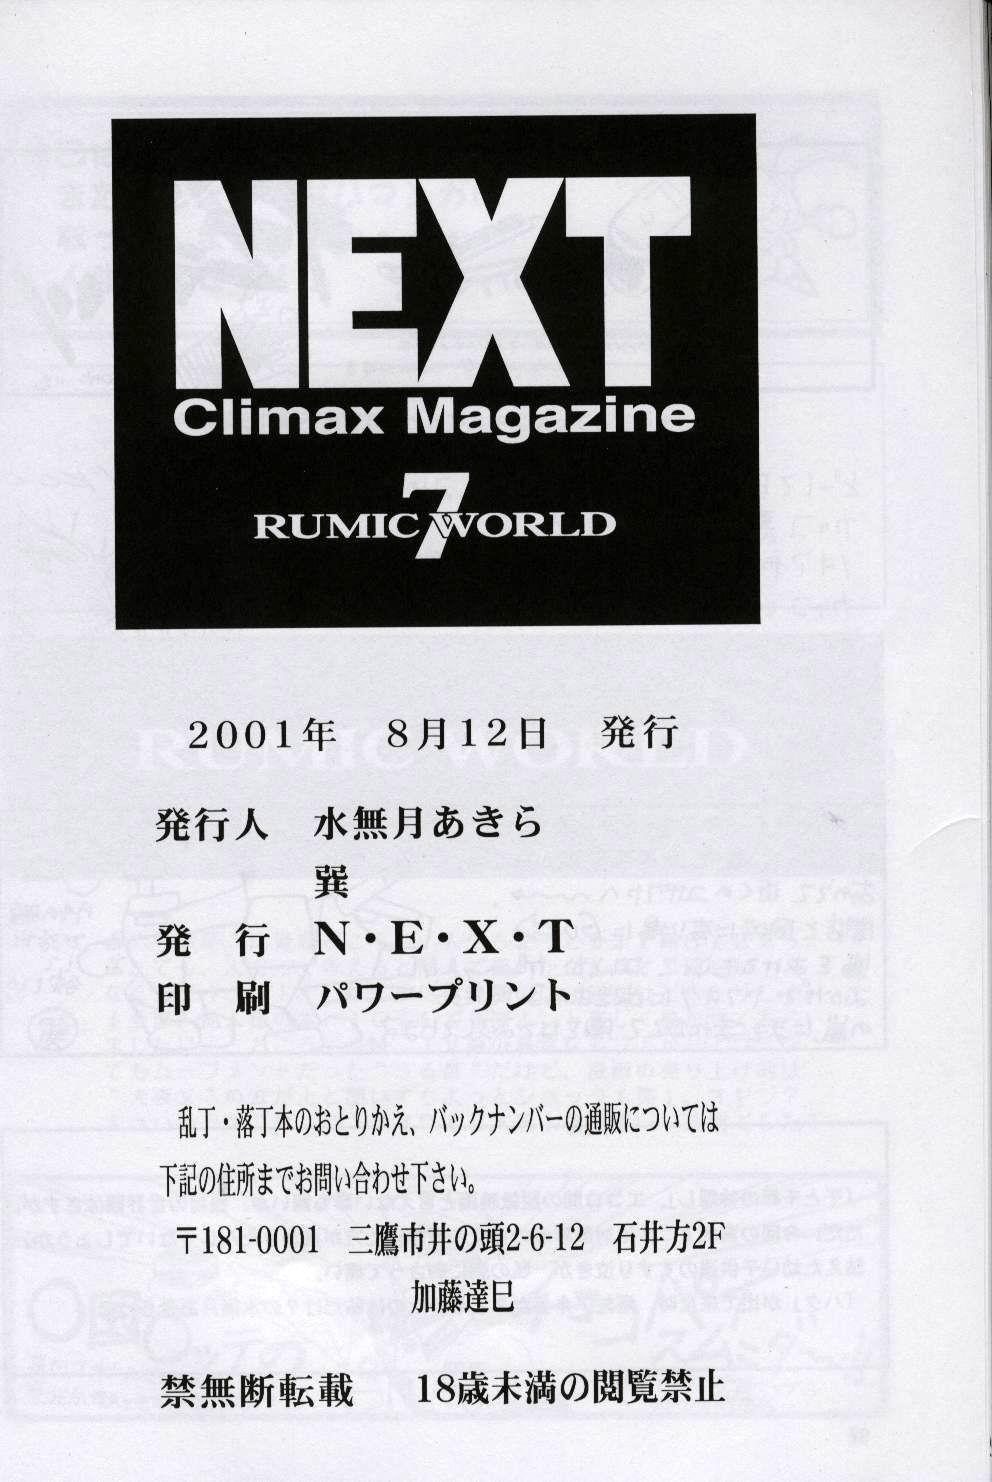 Next Climax Magazine 7 - Rumic World 96